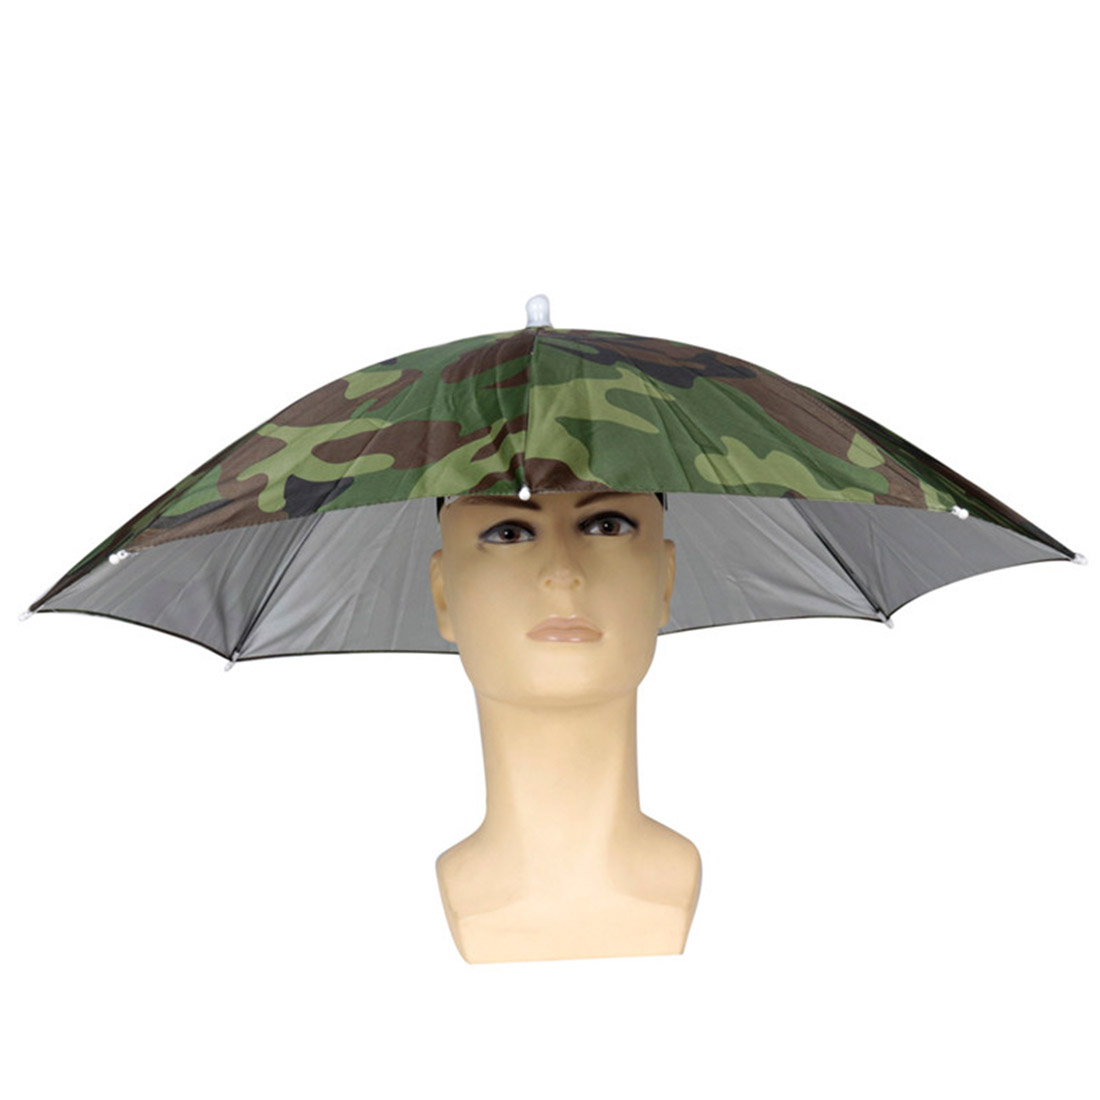 Foldable Rain Gear Fishing Hat Headwear Umbrella for Fishing Hiking Beach Cap Head Hats Outdoor Camping Equipment